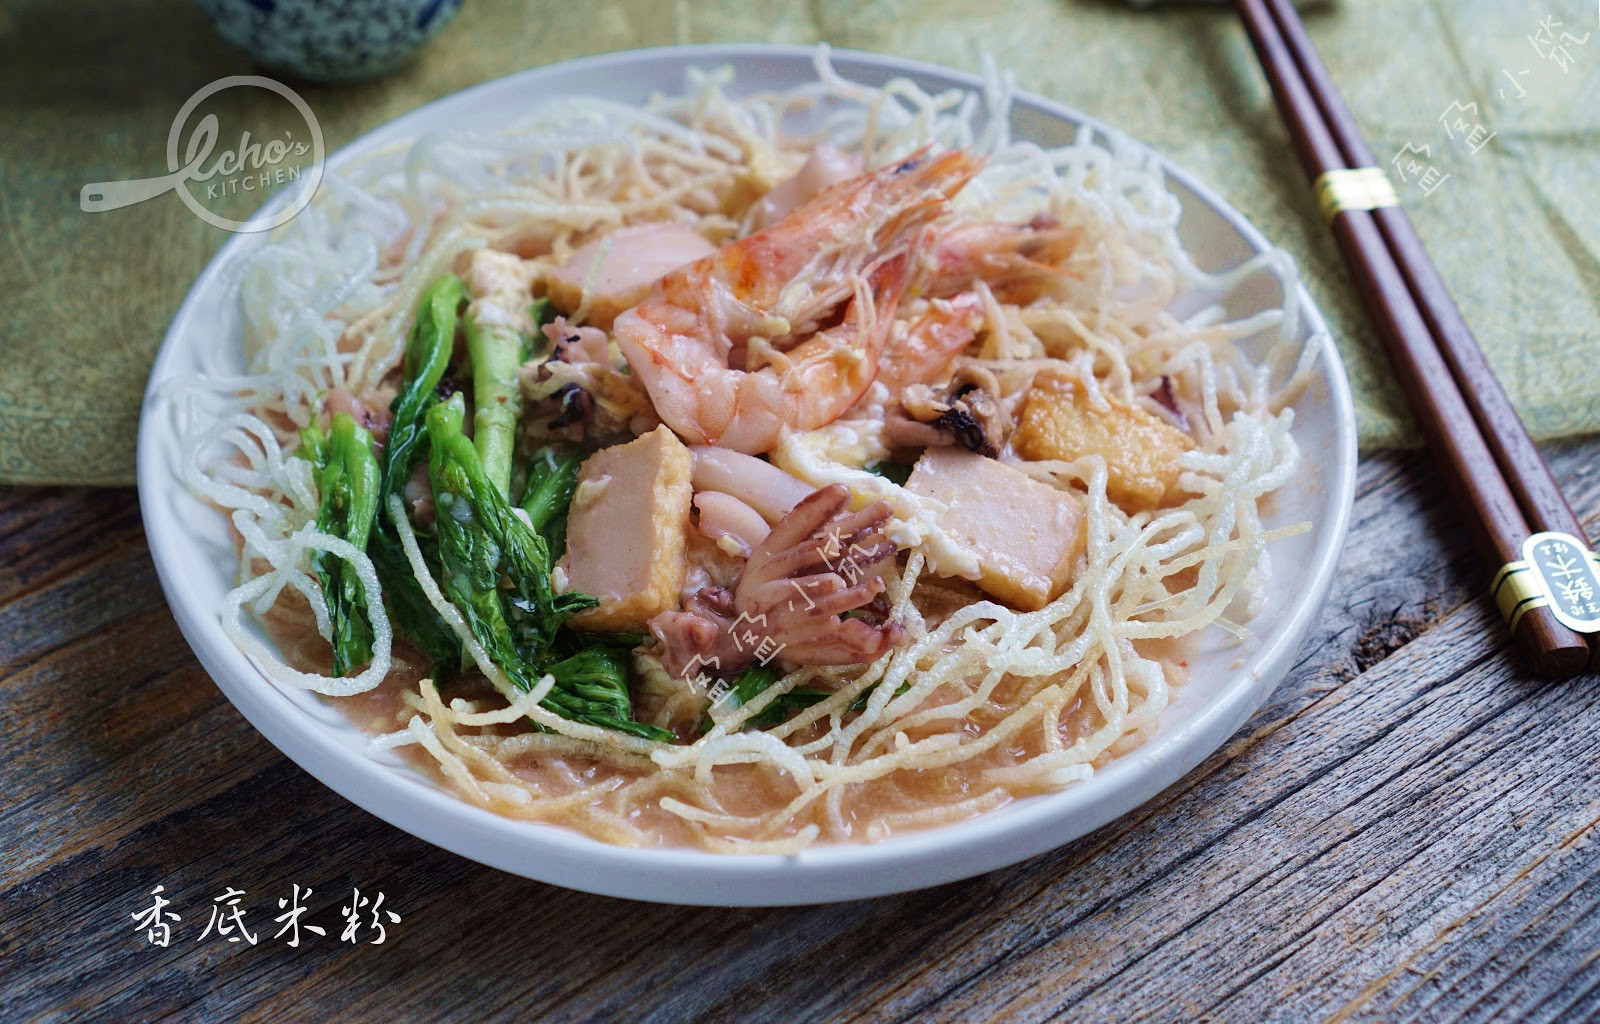 Crispy Rice Noodles  A taste of memories Echo s Kitchen Seafood Crispy Rice